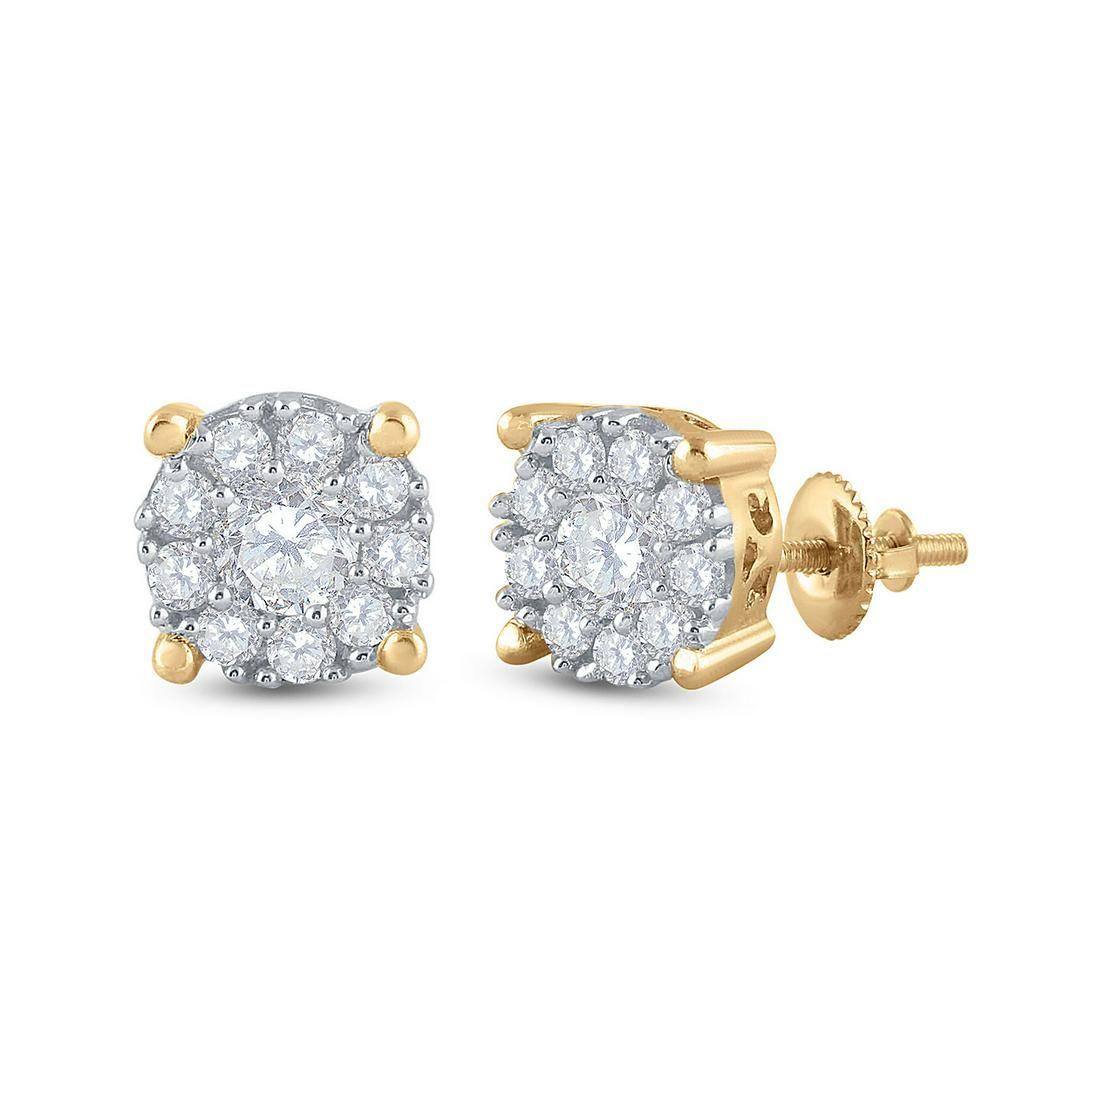 14kt Yellow Gold Womens Round Diamond Halo Earrings 3/4